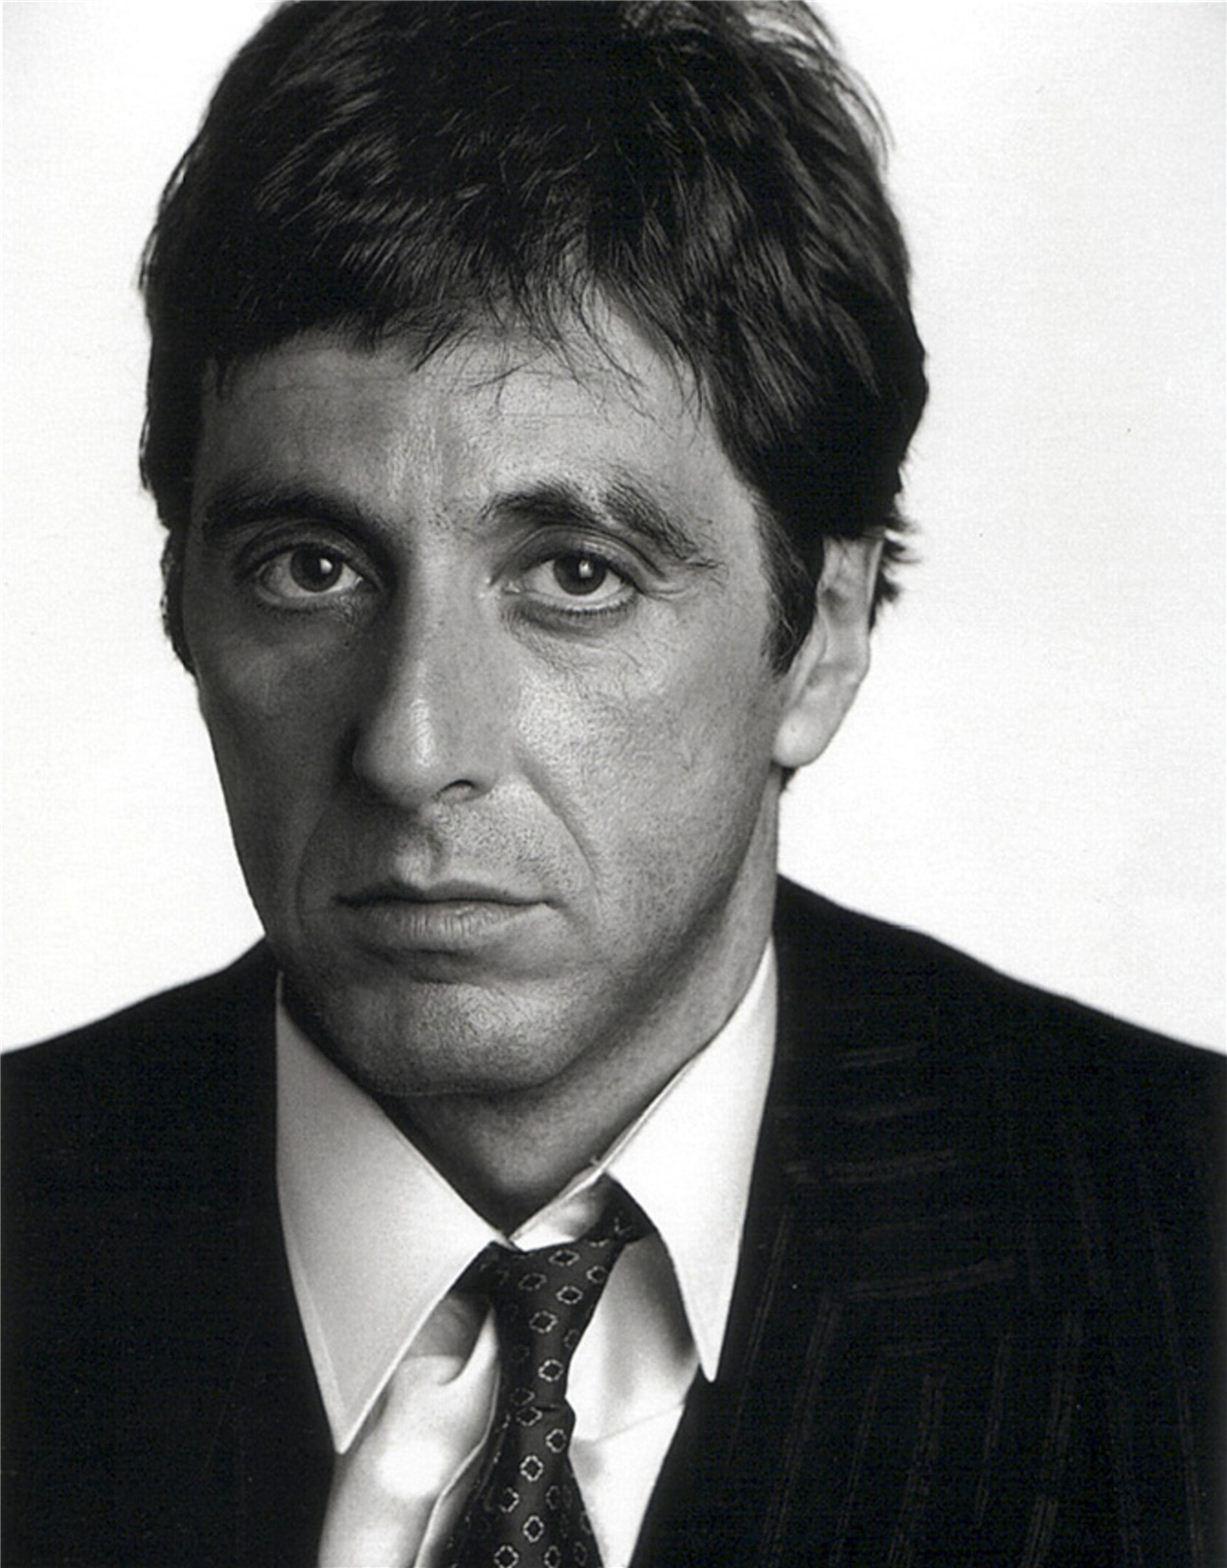 Al Pacino / Аль Пачино - портрет фотографа Грега Гормана / Greg Gorman